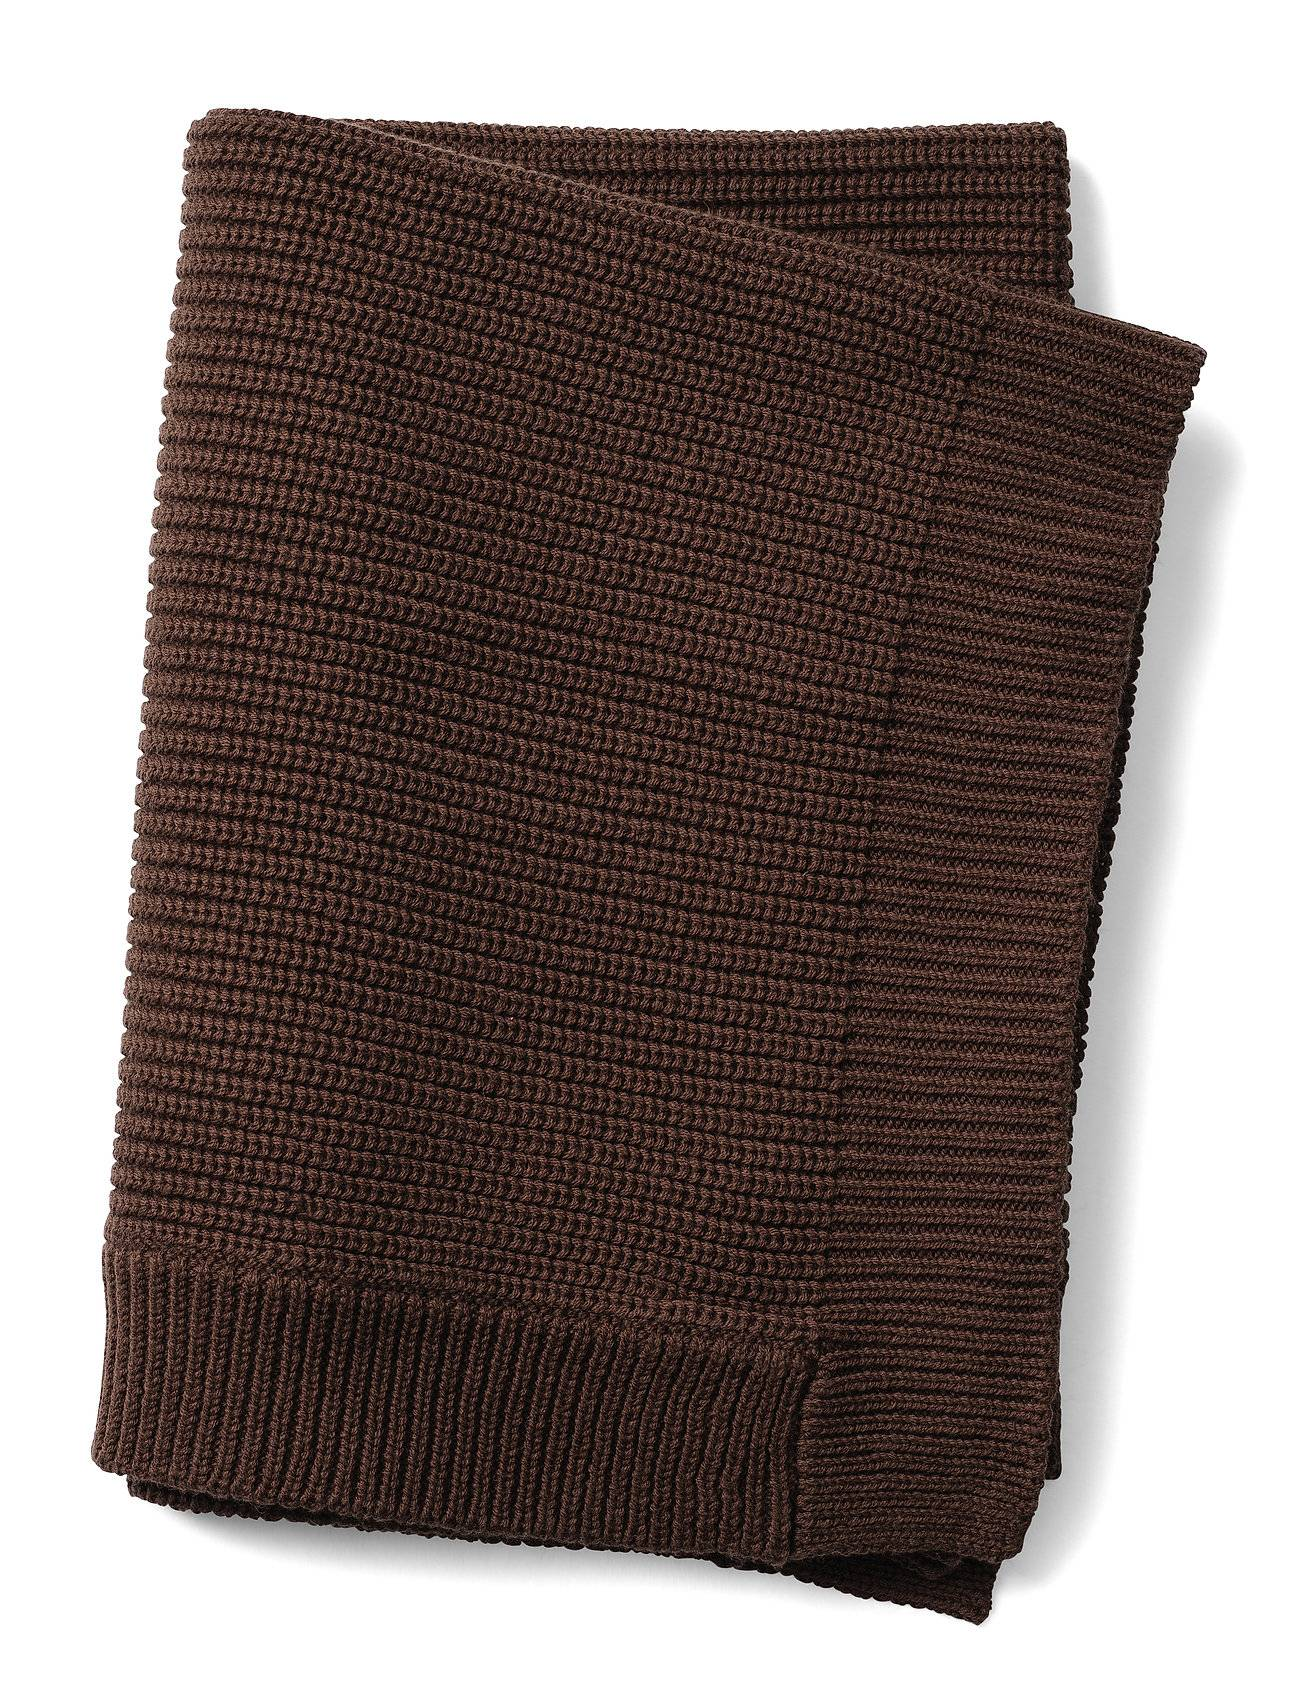 Elodie Details Wool Knitted Blanket- Chocolate Home Sleep Time Blankets & Quilts Ruskea Elodie Details